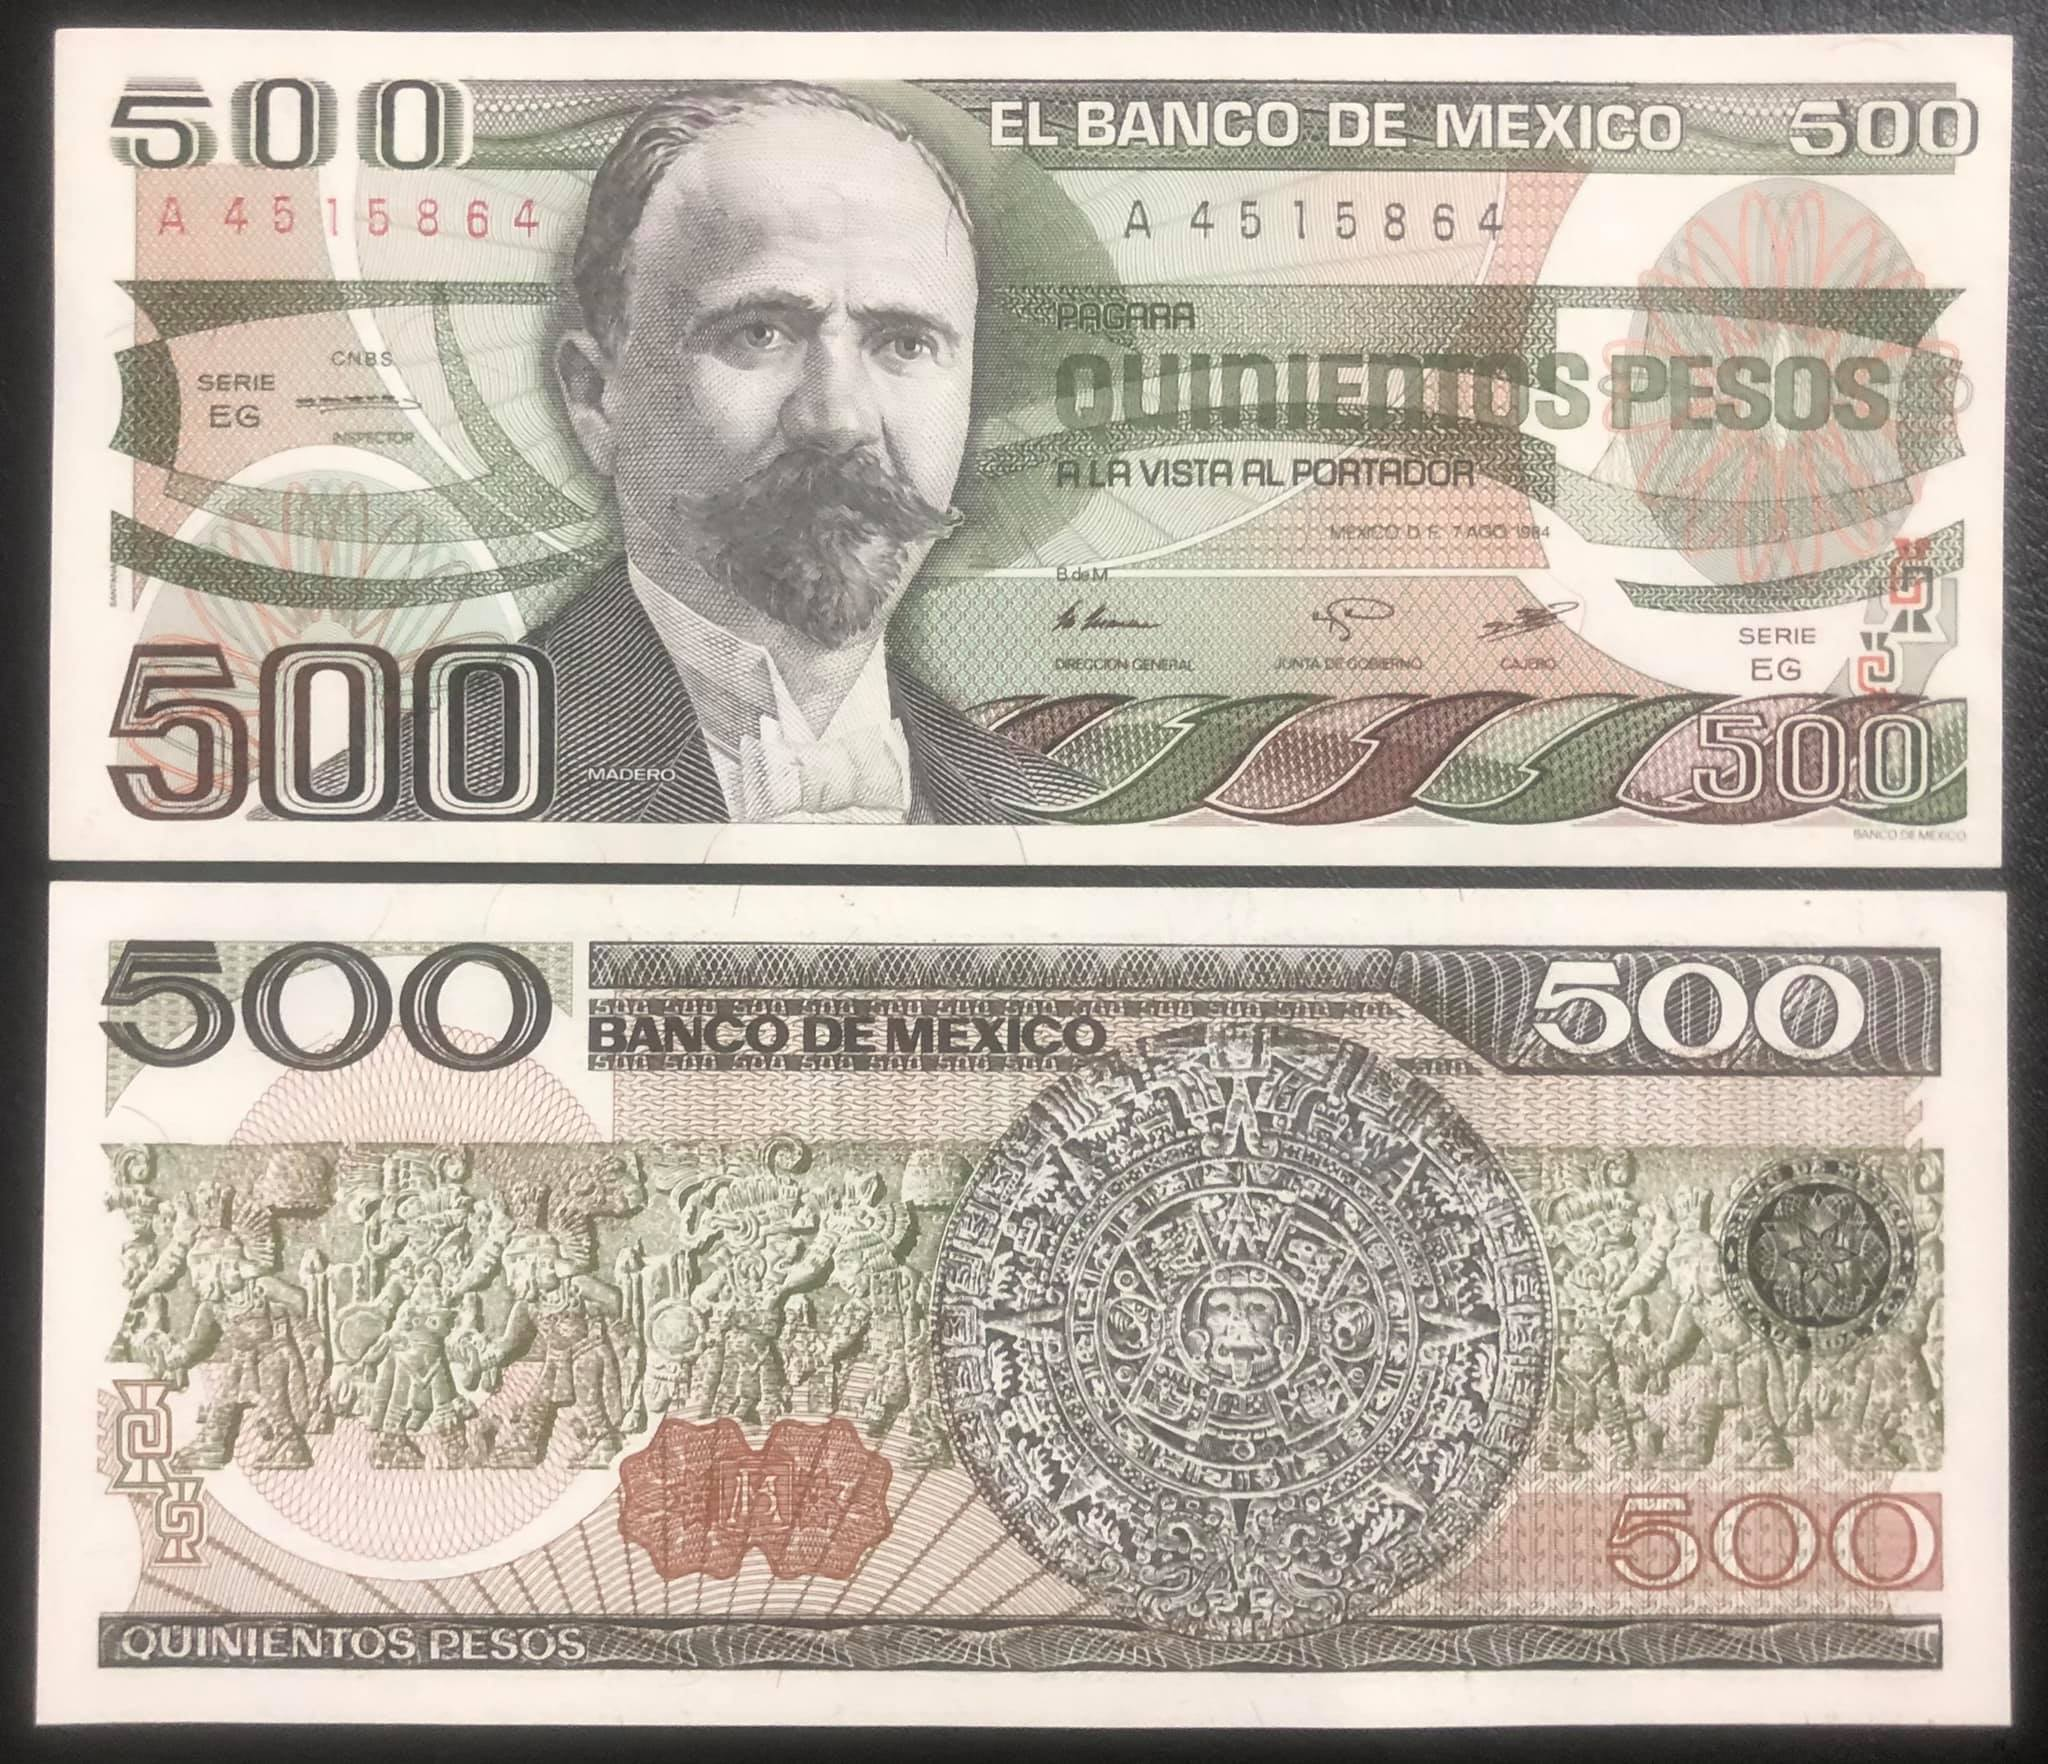 Tiền cổ Mexico 500 pesos sưu tầm